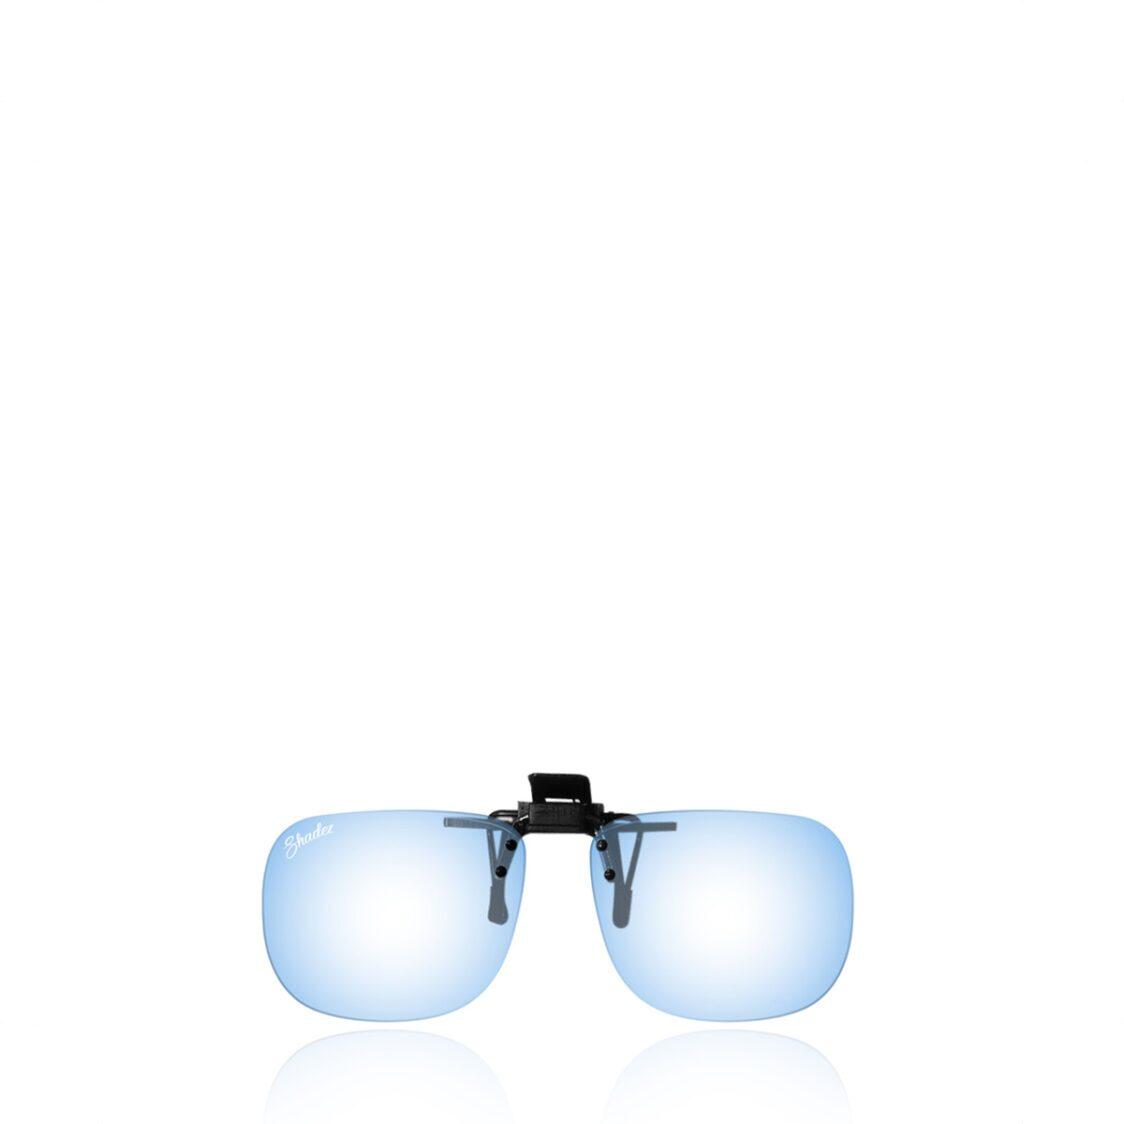 Shadez Eyewear Blue Light Clip On Teeny Aged 7-16 Years Old SHZ-310